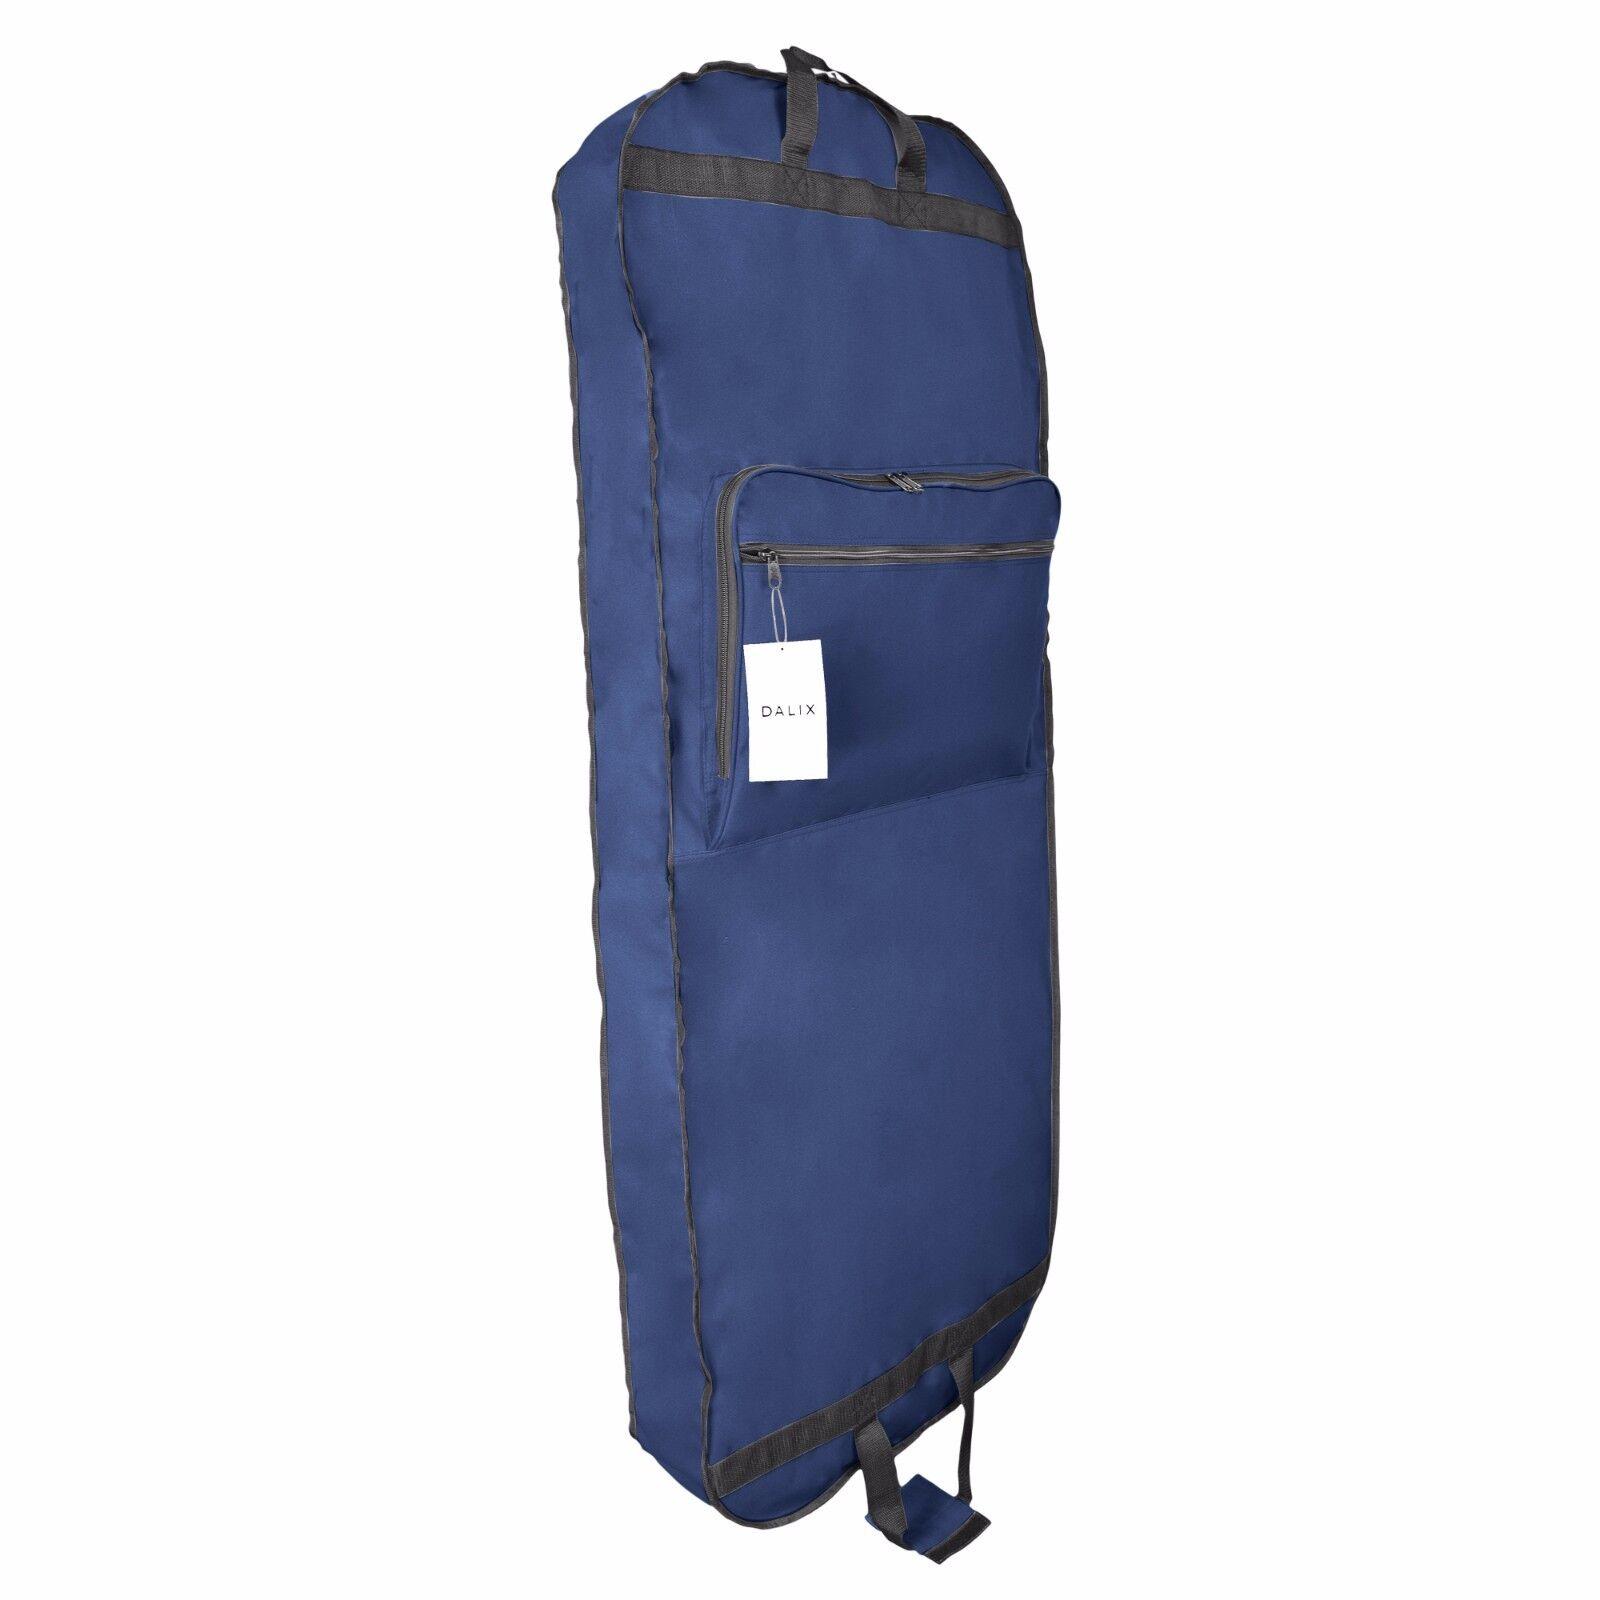 DALIX 60″ Professional Garment Bag Cover Suits Pants Gowns Dresses Foldable Blue Luggage